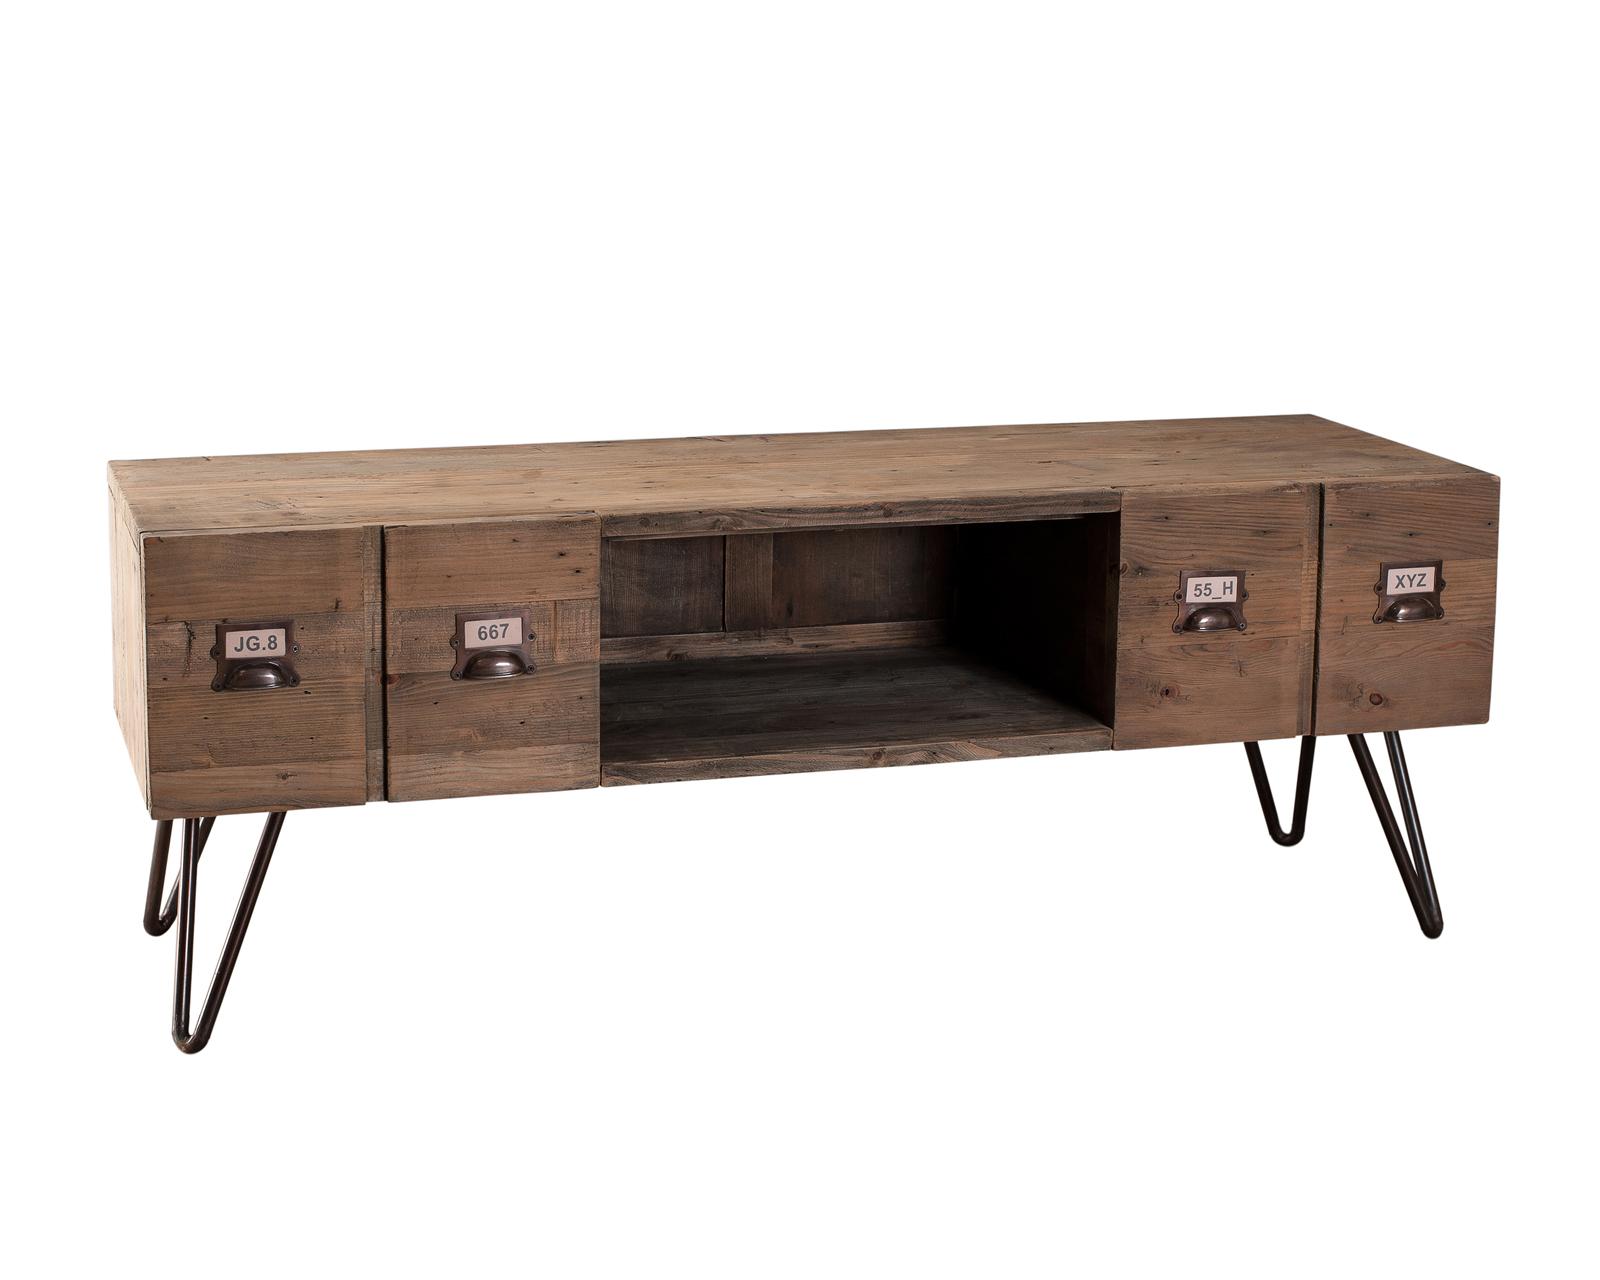 meuble tv 2 tiroirs pin recycle 130 5x40 5x48 5cm atelier meubles tv pier import